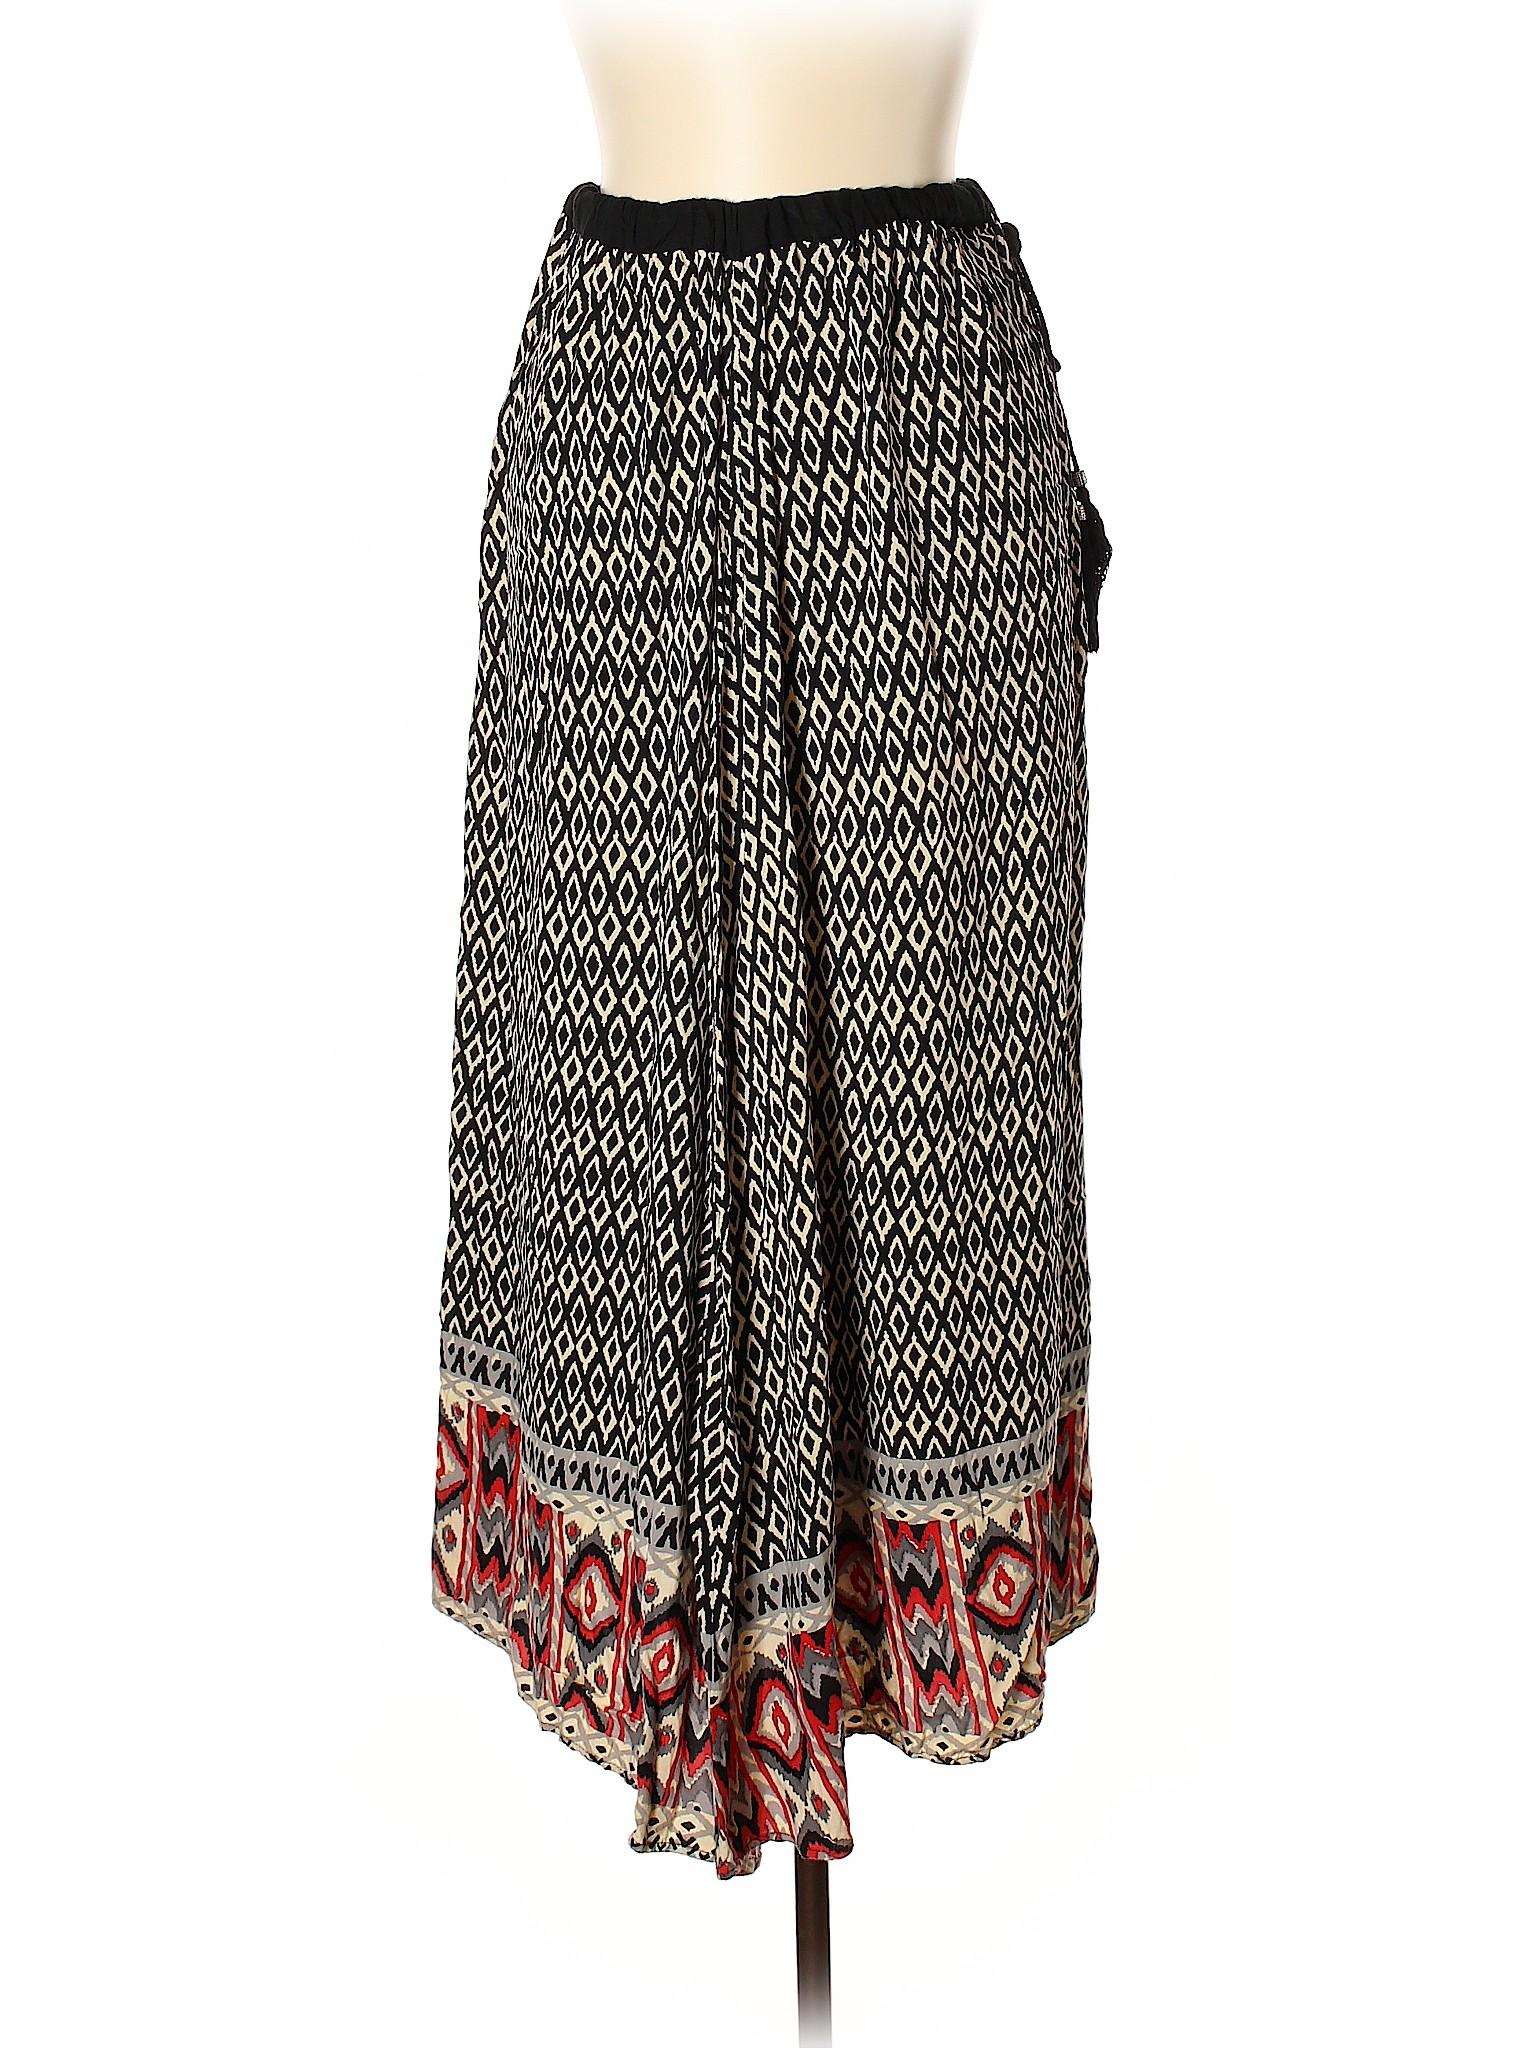 Skirt Boutique Boutique Casual Casual qPw8ZH